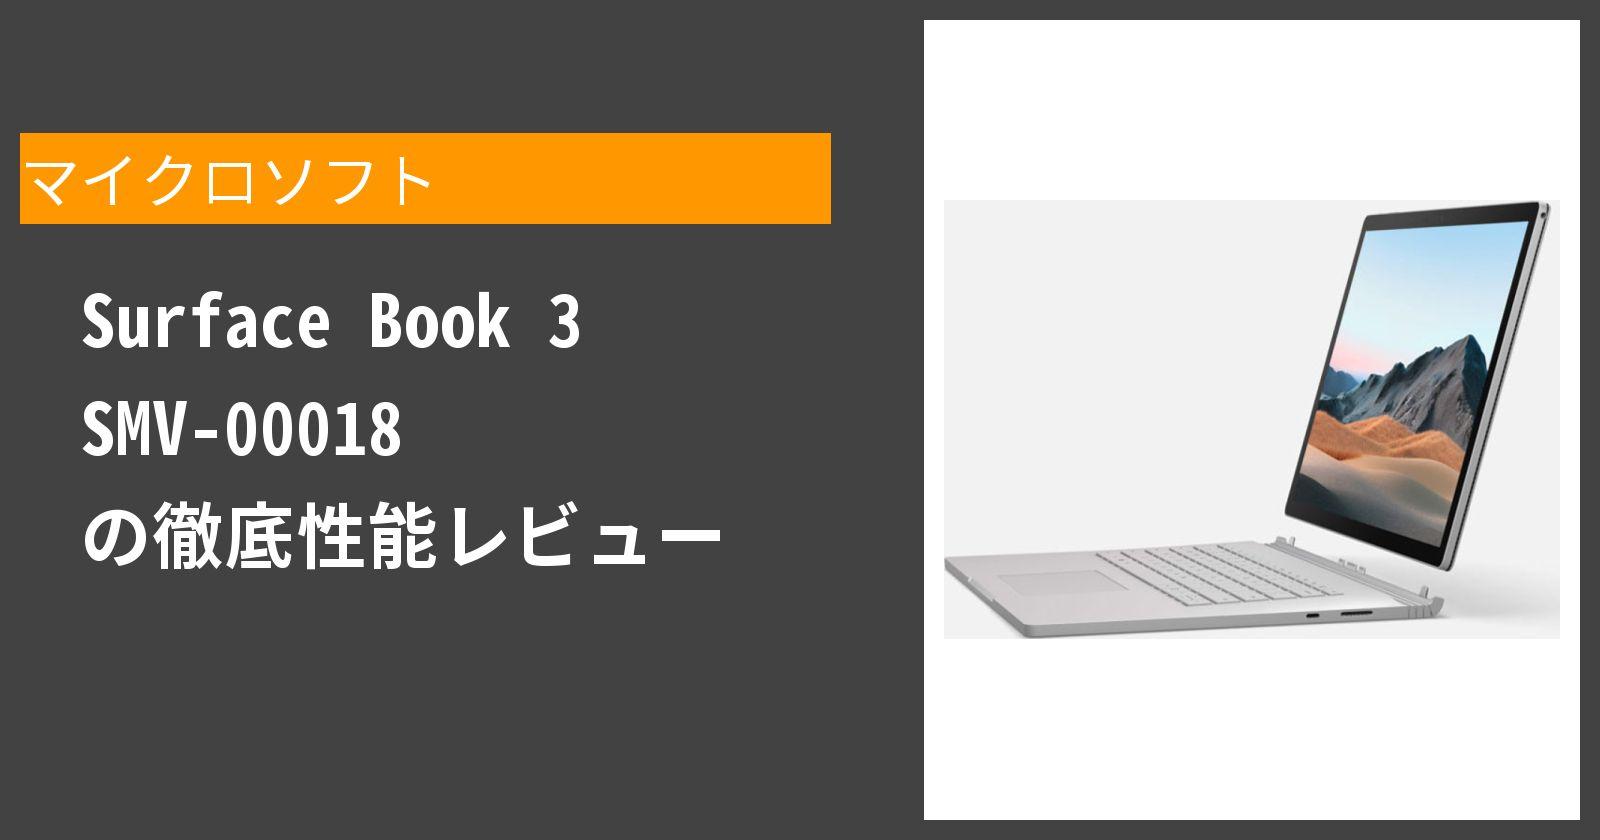 Surface Book 3 SMV-00018 の徹底性能レビュー